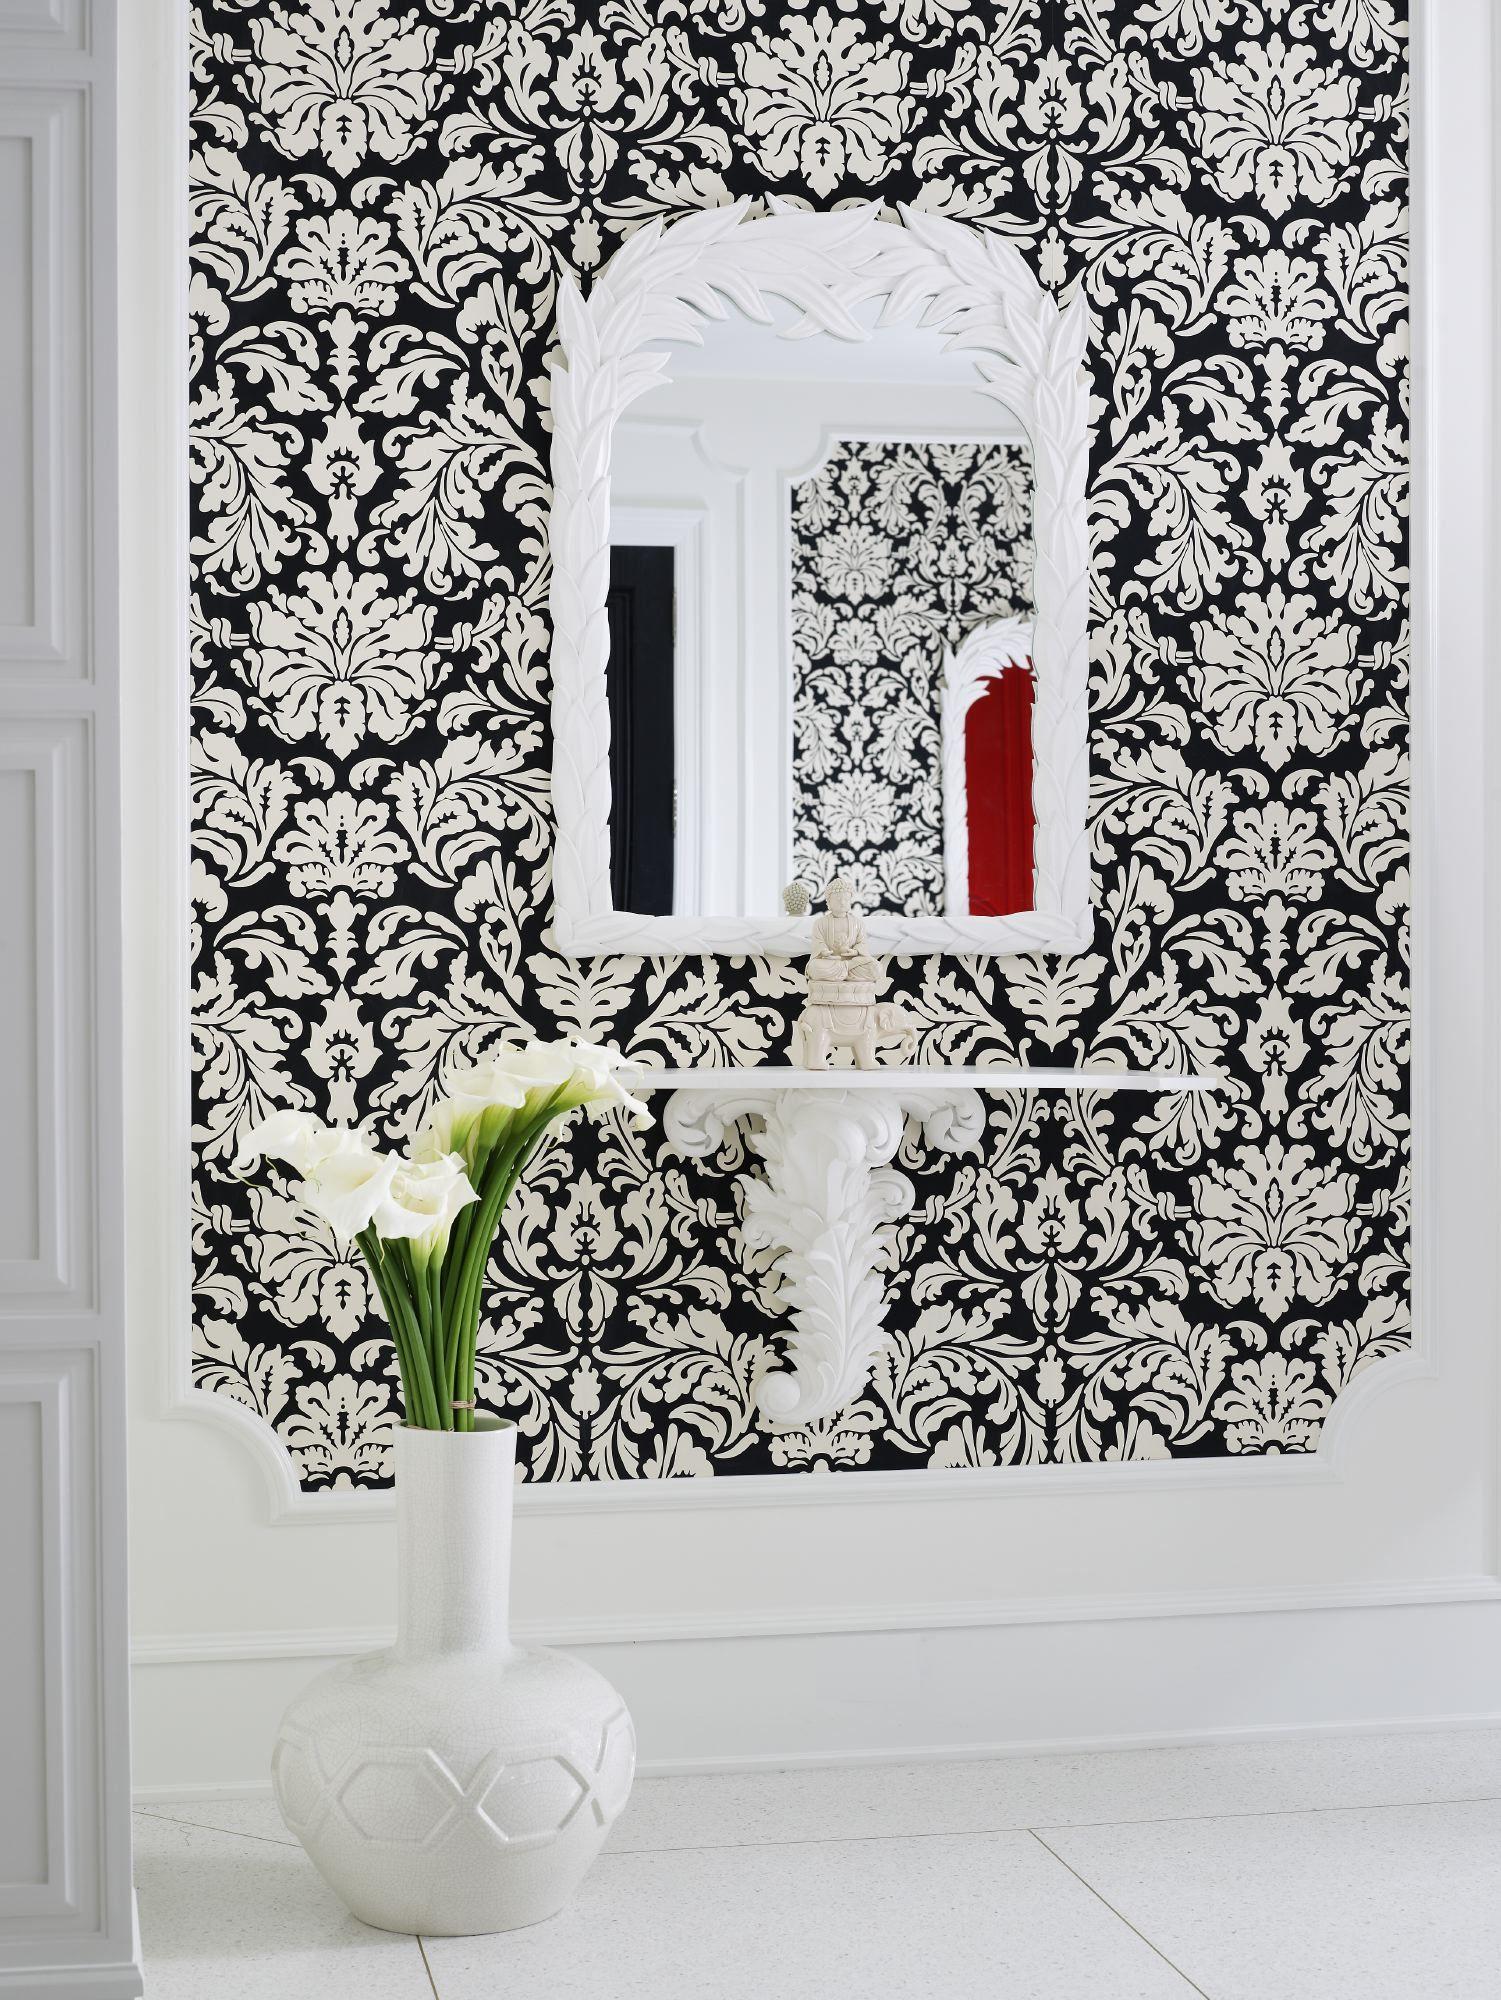 Damask wallpaper hallway ideas  Black and white damask wallpaper by Jamie Herzlinger  House ideas